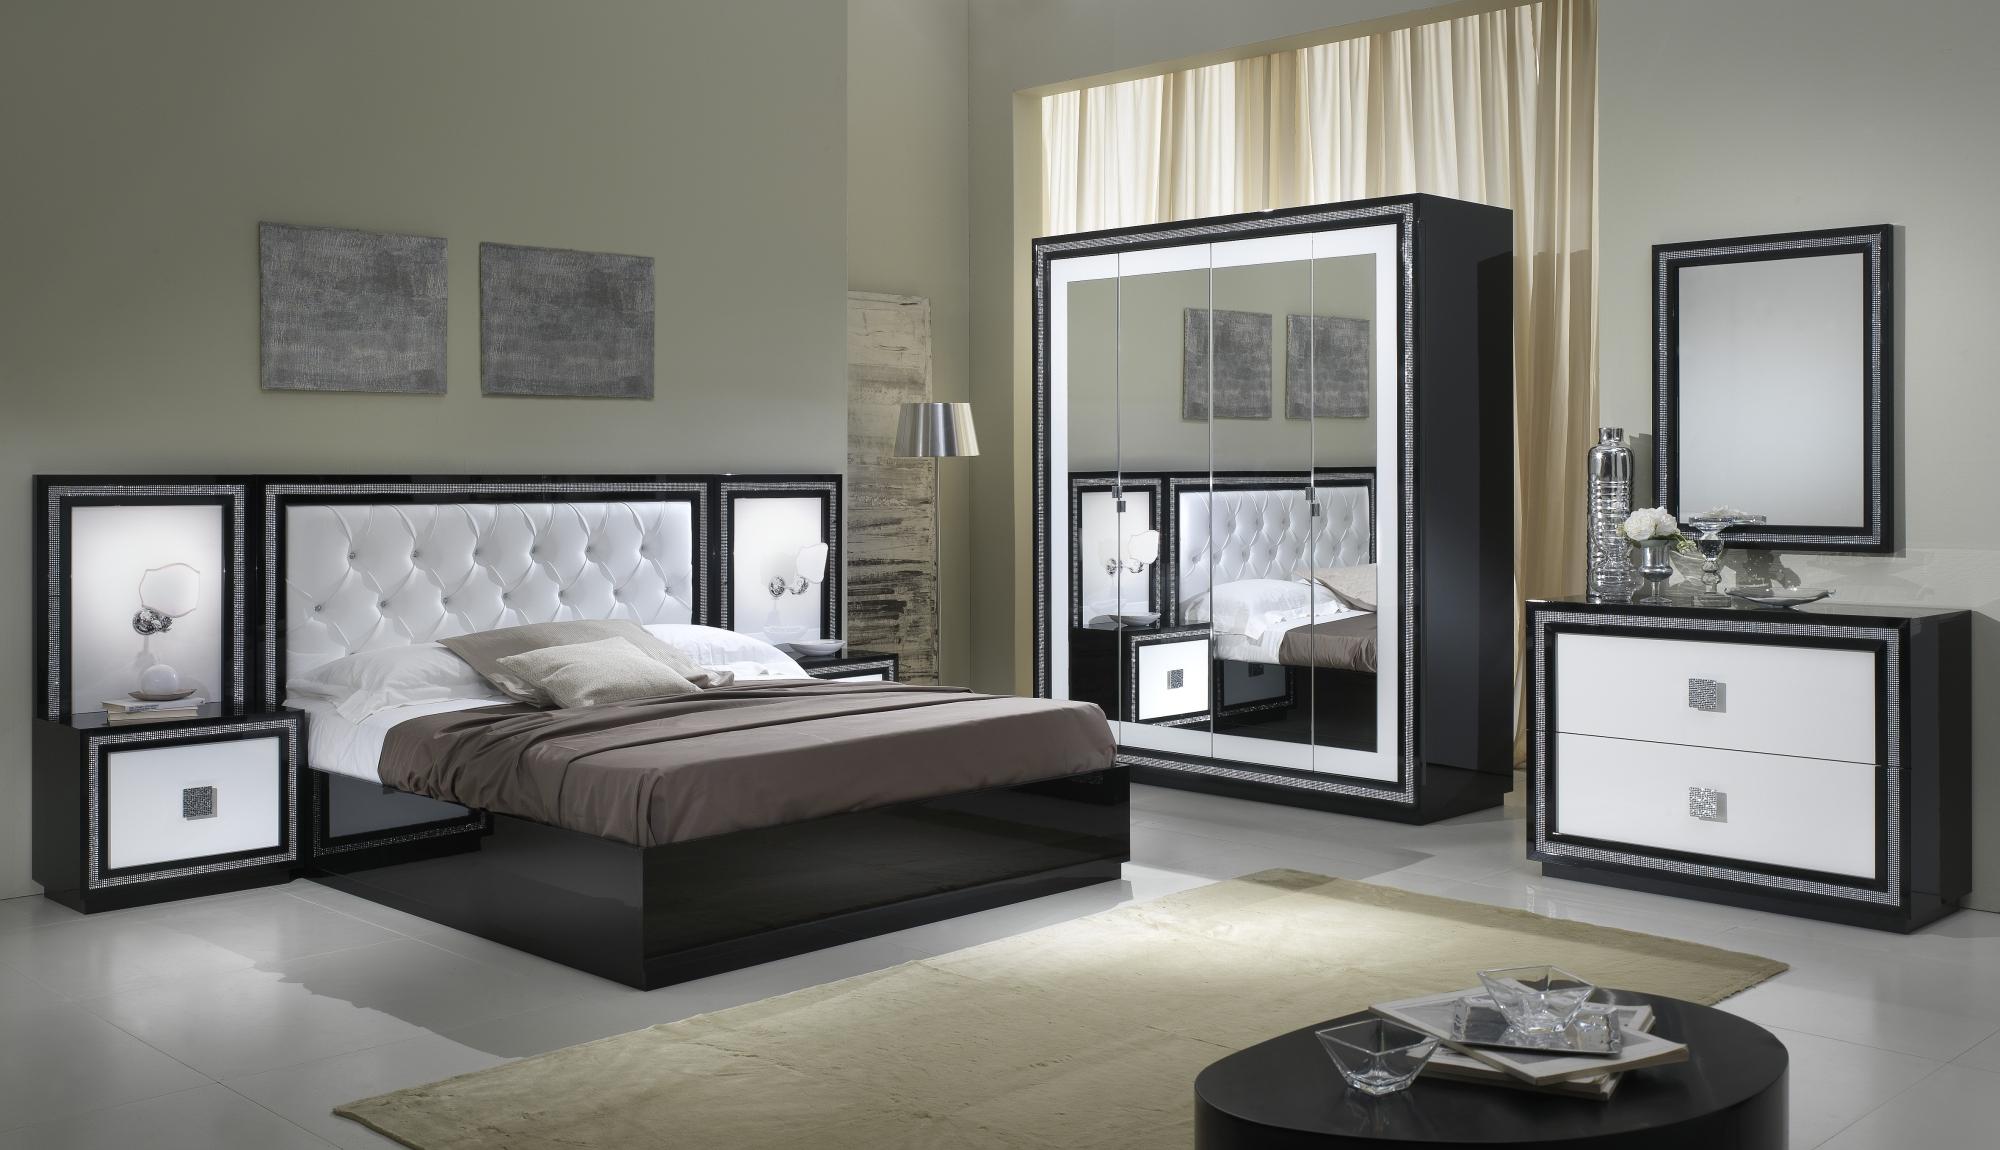 Chambre Adulte Complete Design Laquee Blanche Et Noire Appoline Matelpro